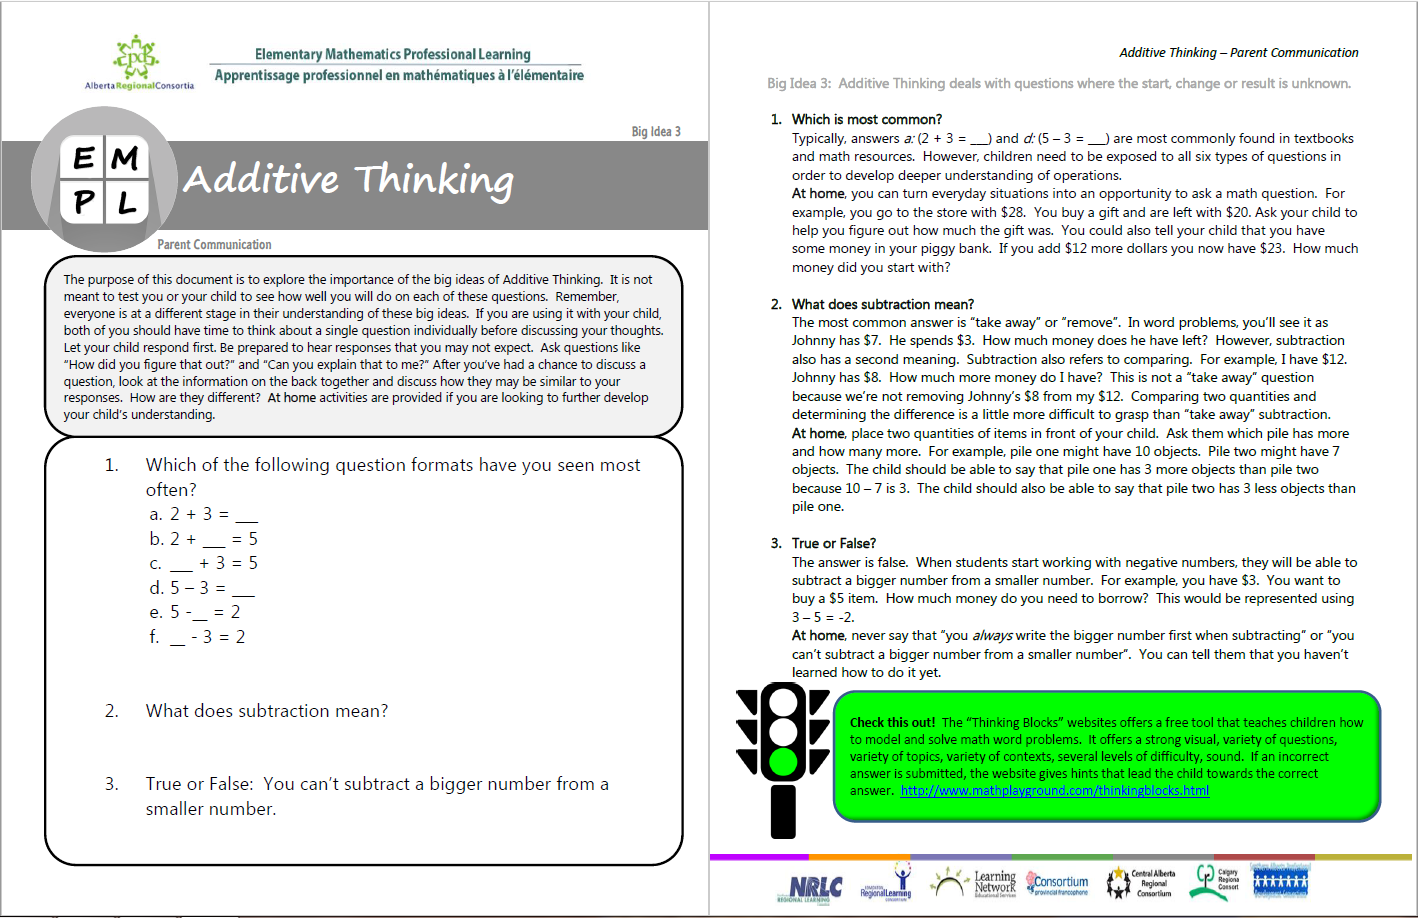 Additive Thinking Big Idea 3